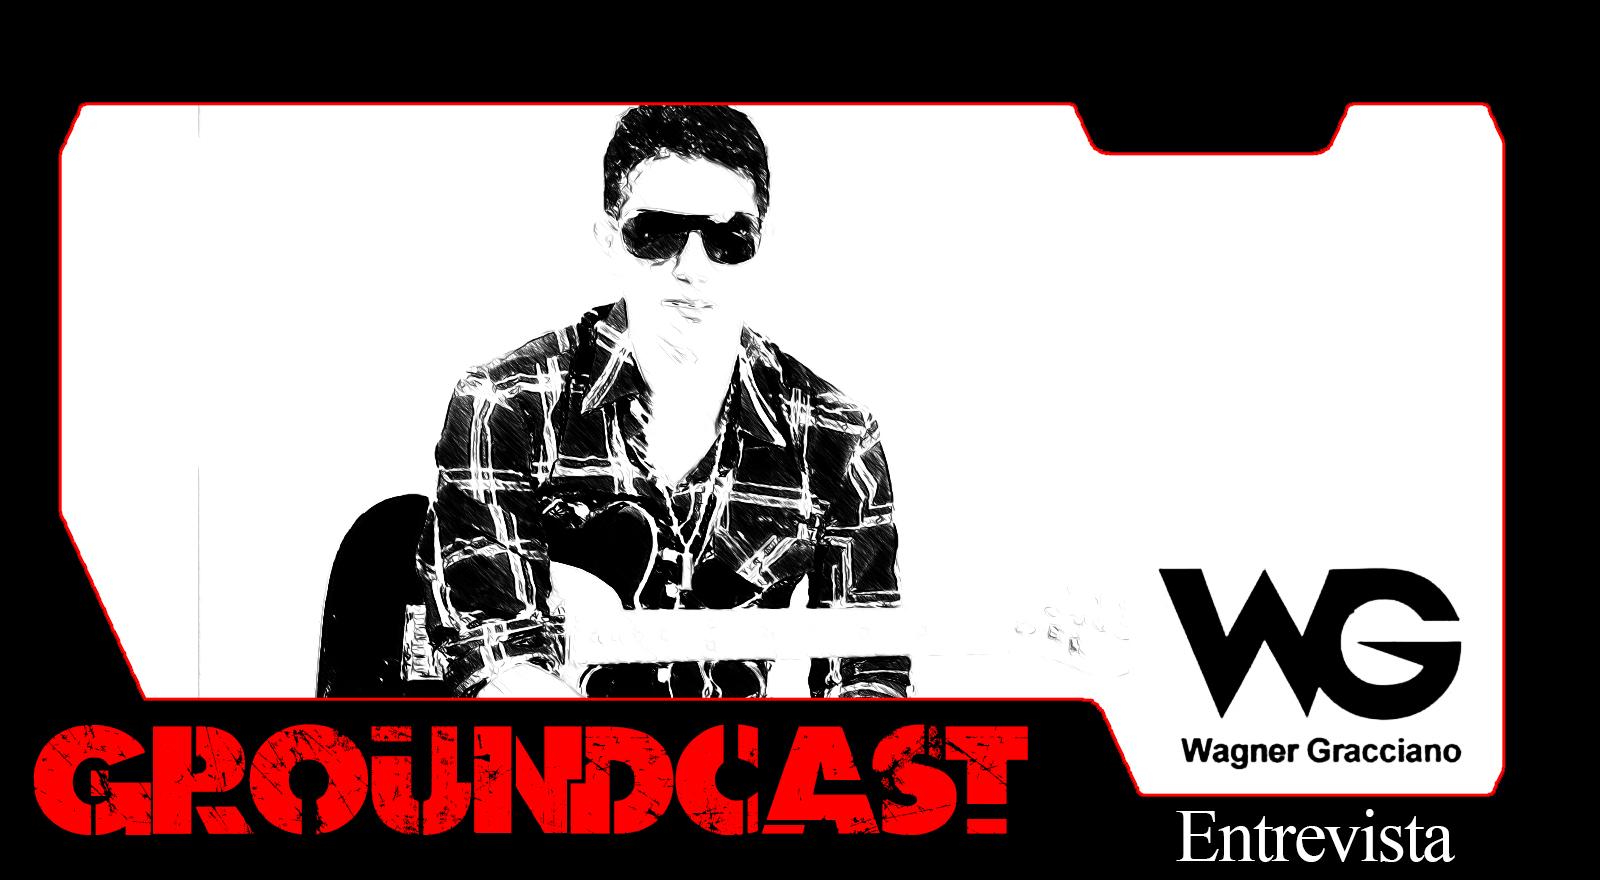 Groundcast Entrevista #13: Wagner Gracciano